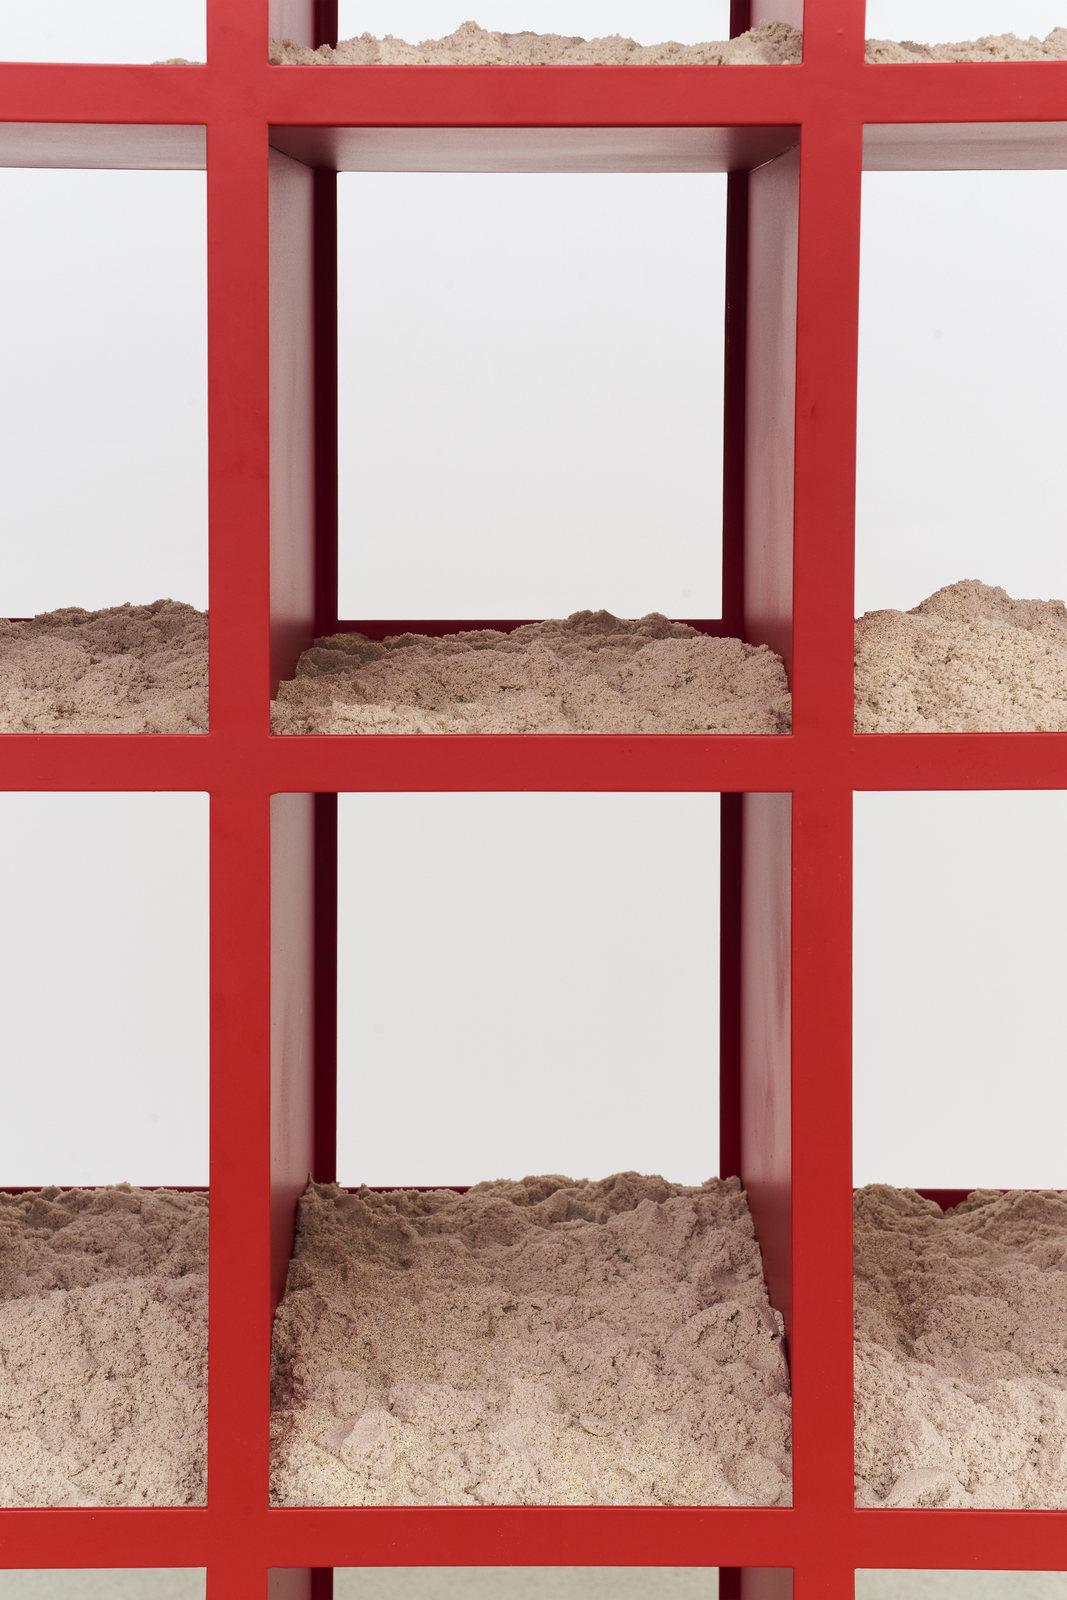 Wermers_Sand Shelf #1, 2016-2017_Powdercoated steel, kinetic sand_91 7_16 x 91 7_16 x 16_NW00036ST_detail2